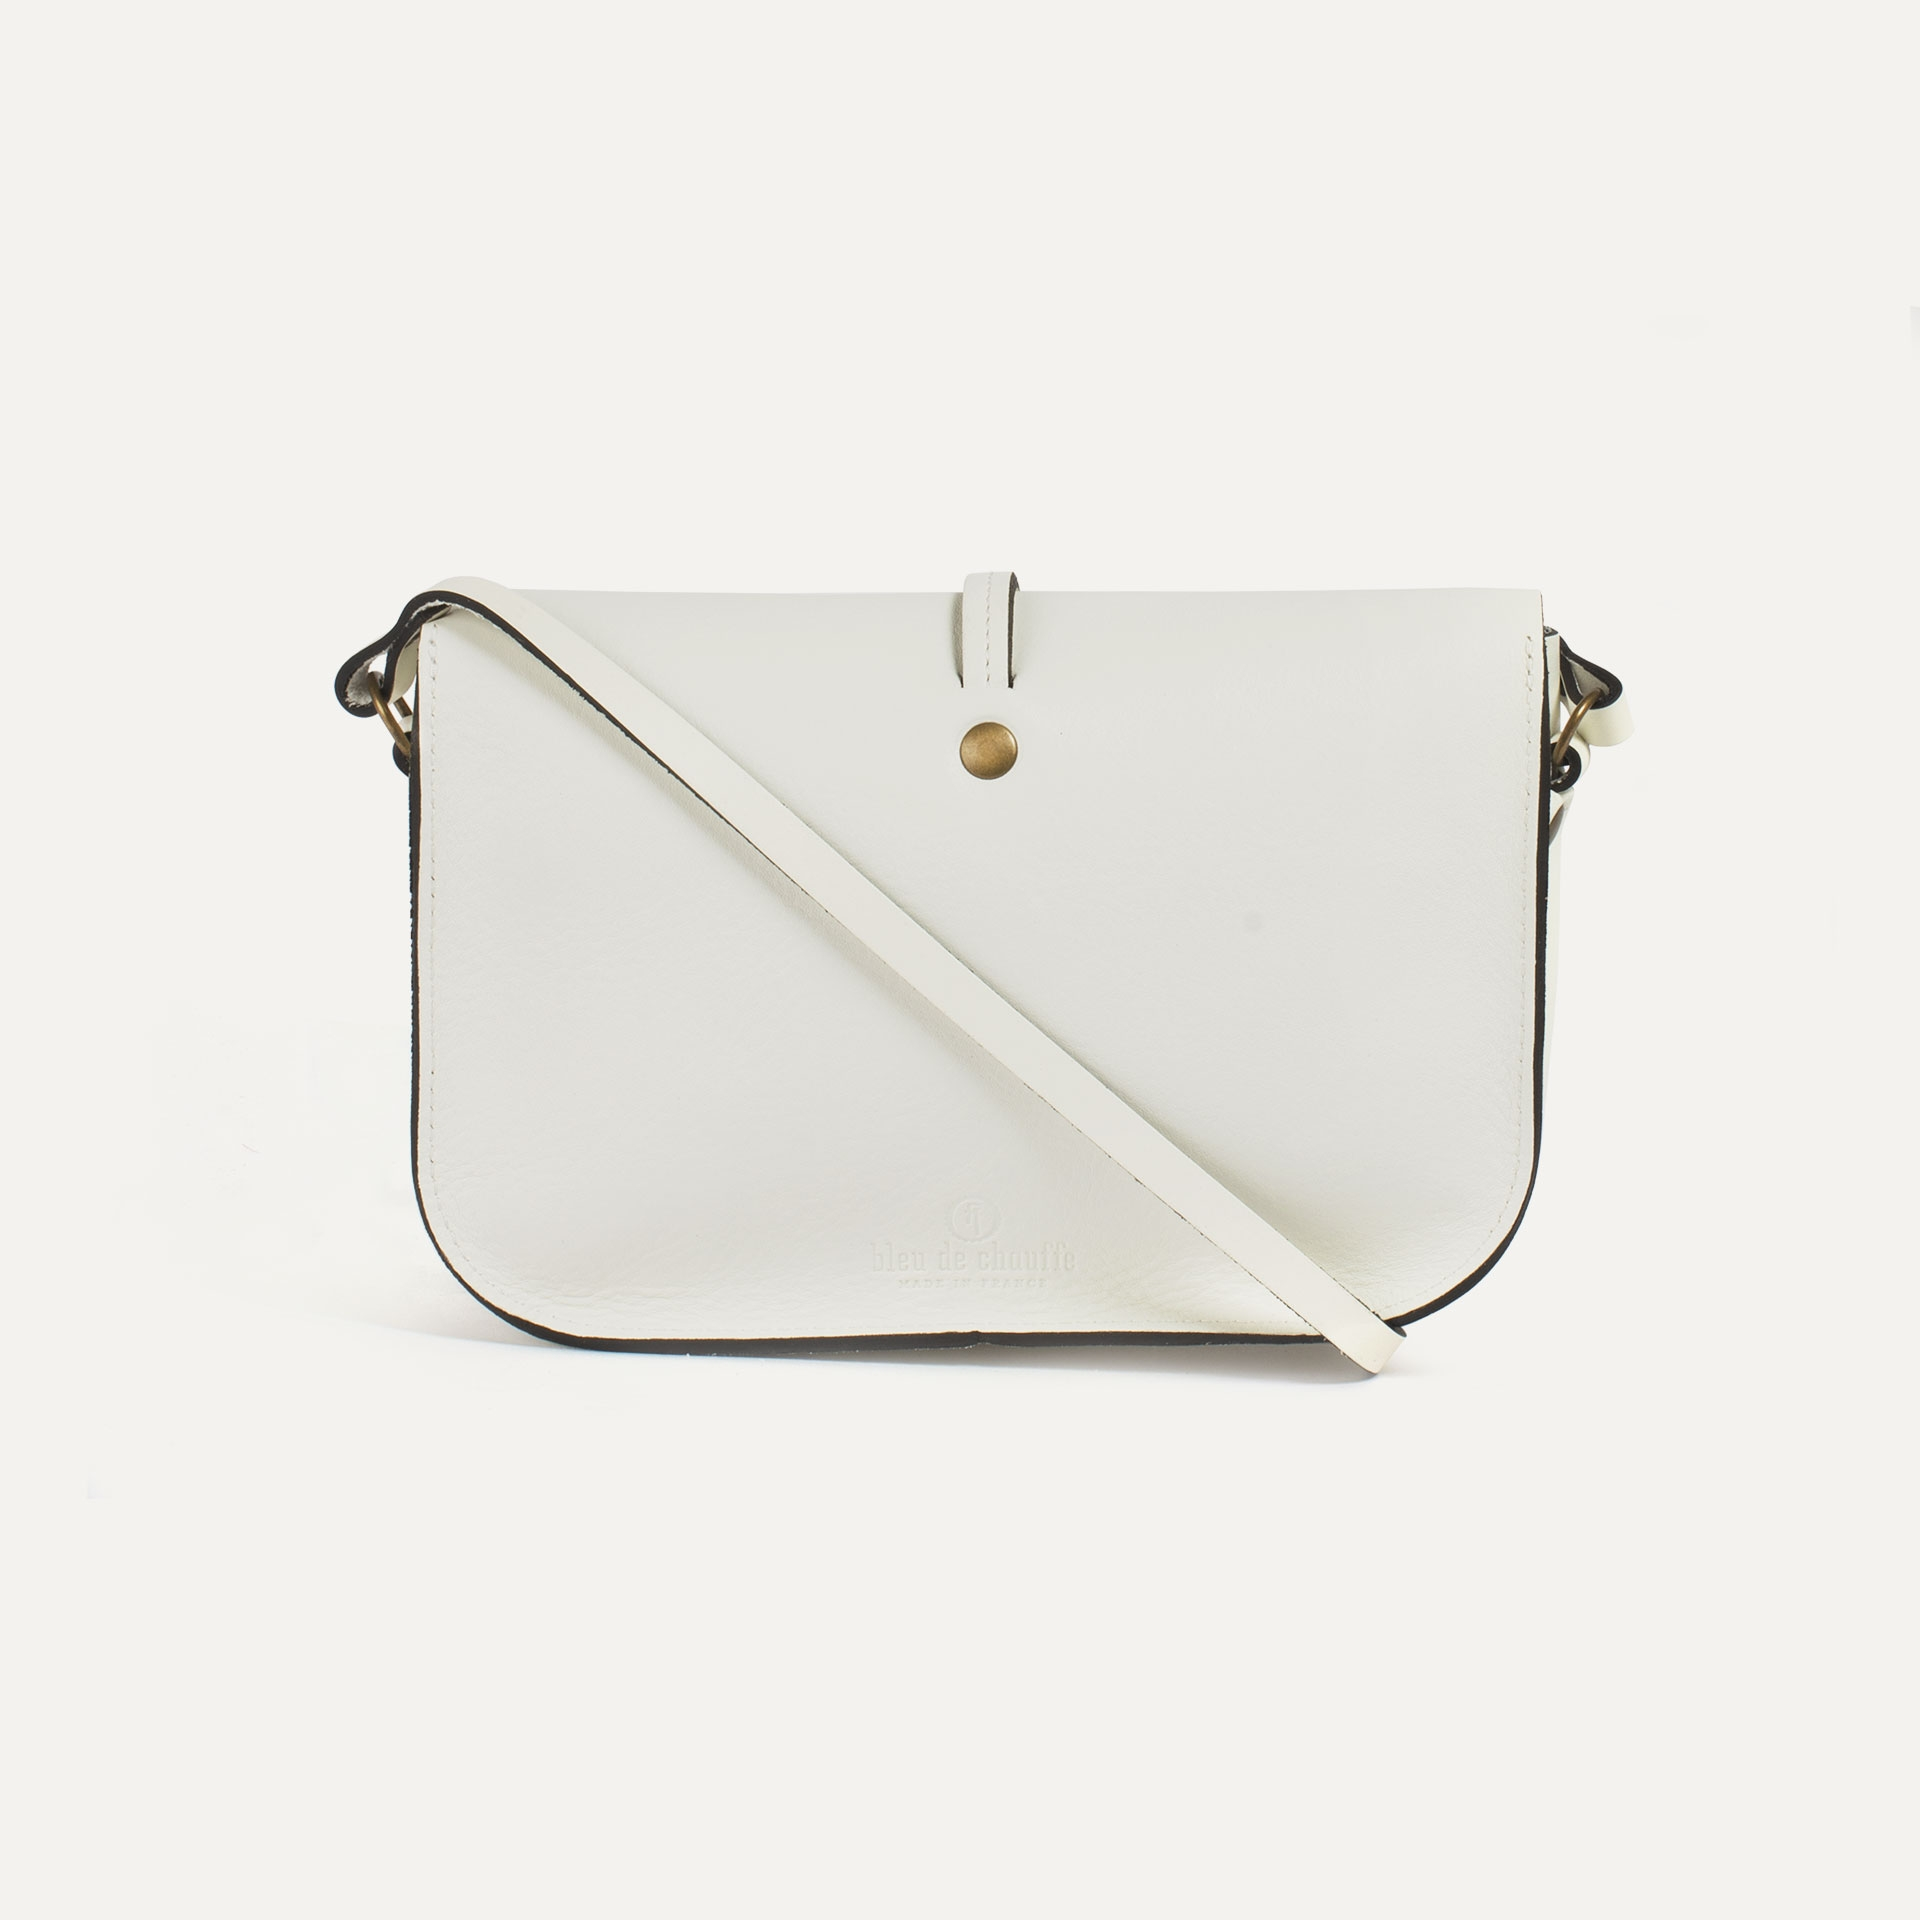 Pastis handbag - White (image n°3)